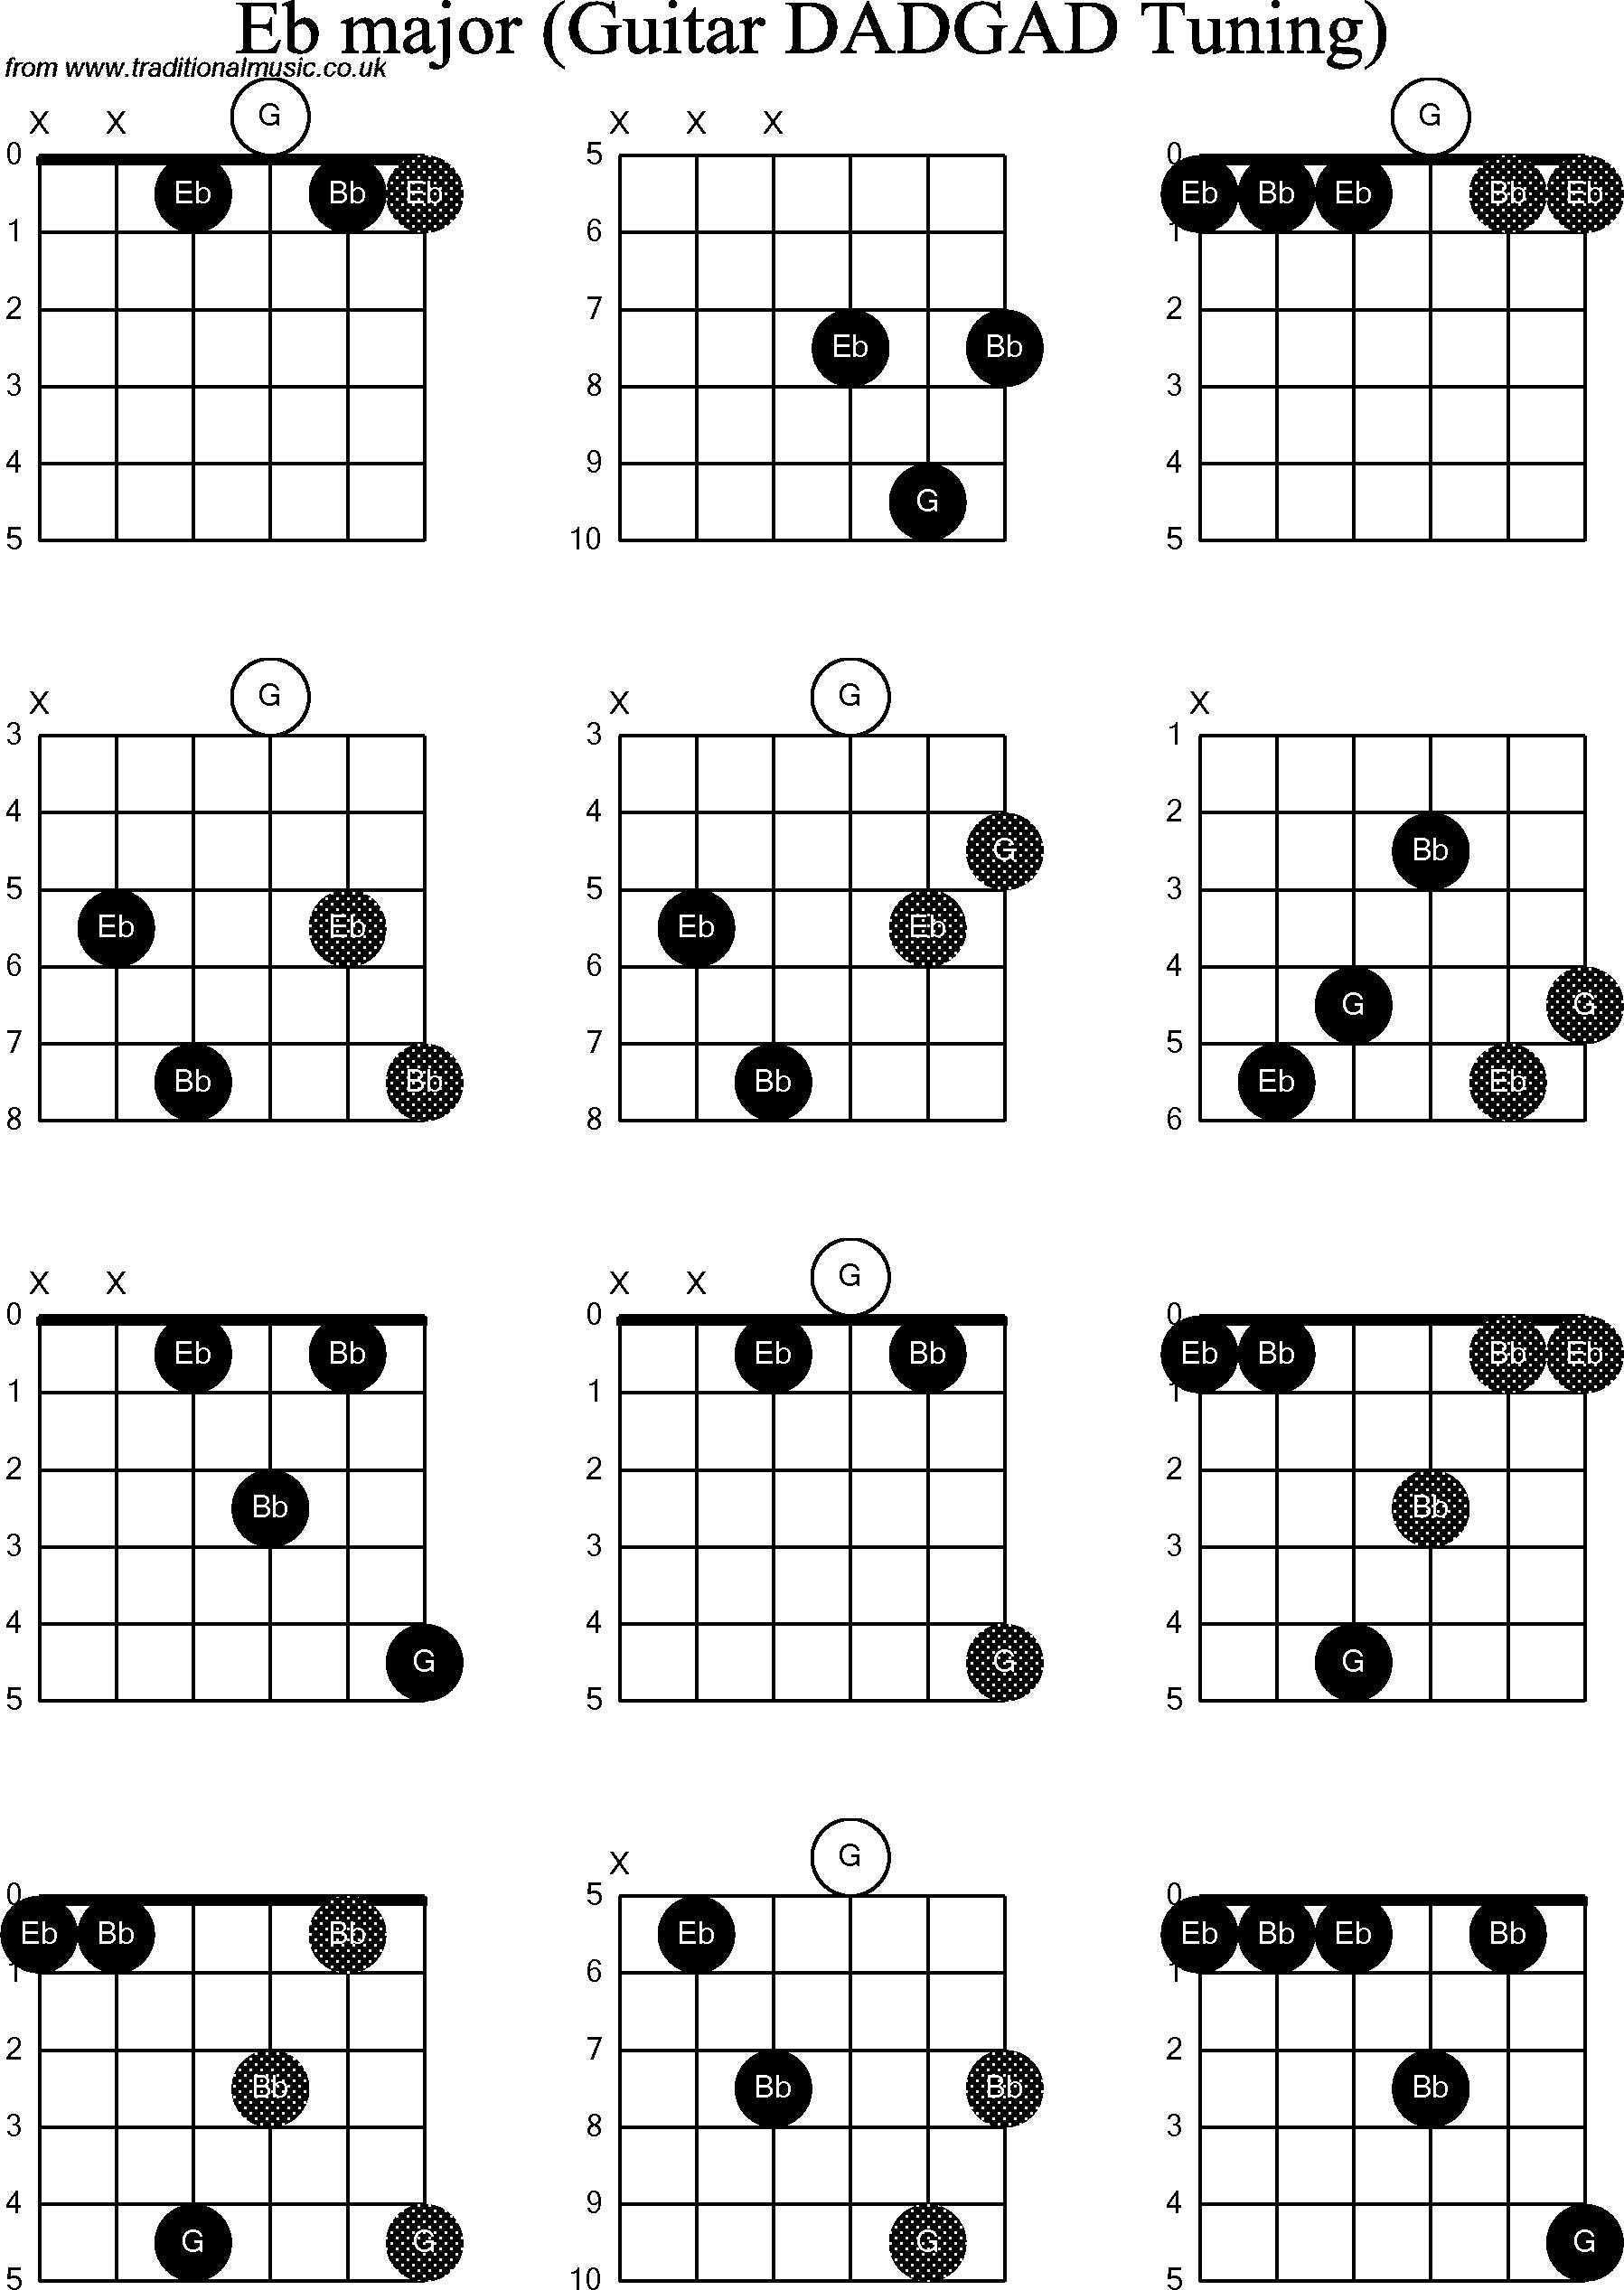 Chord Diagrams for D Modal Guitar(DADGAD), Eb